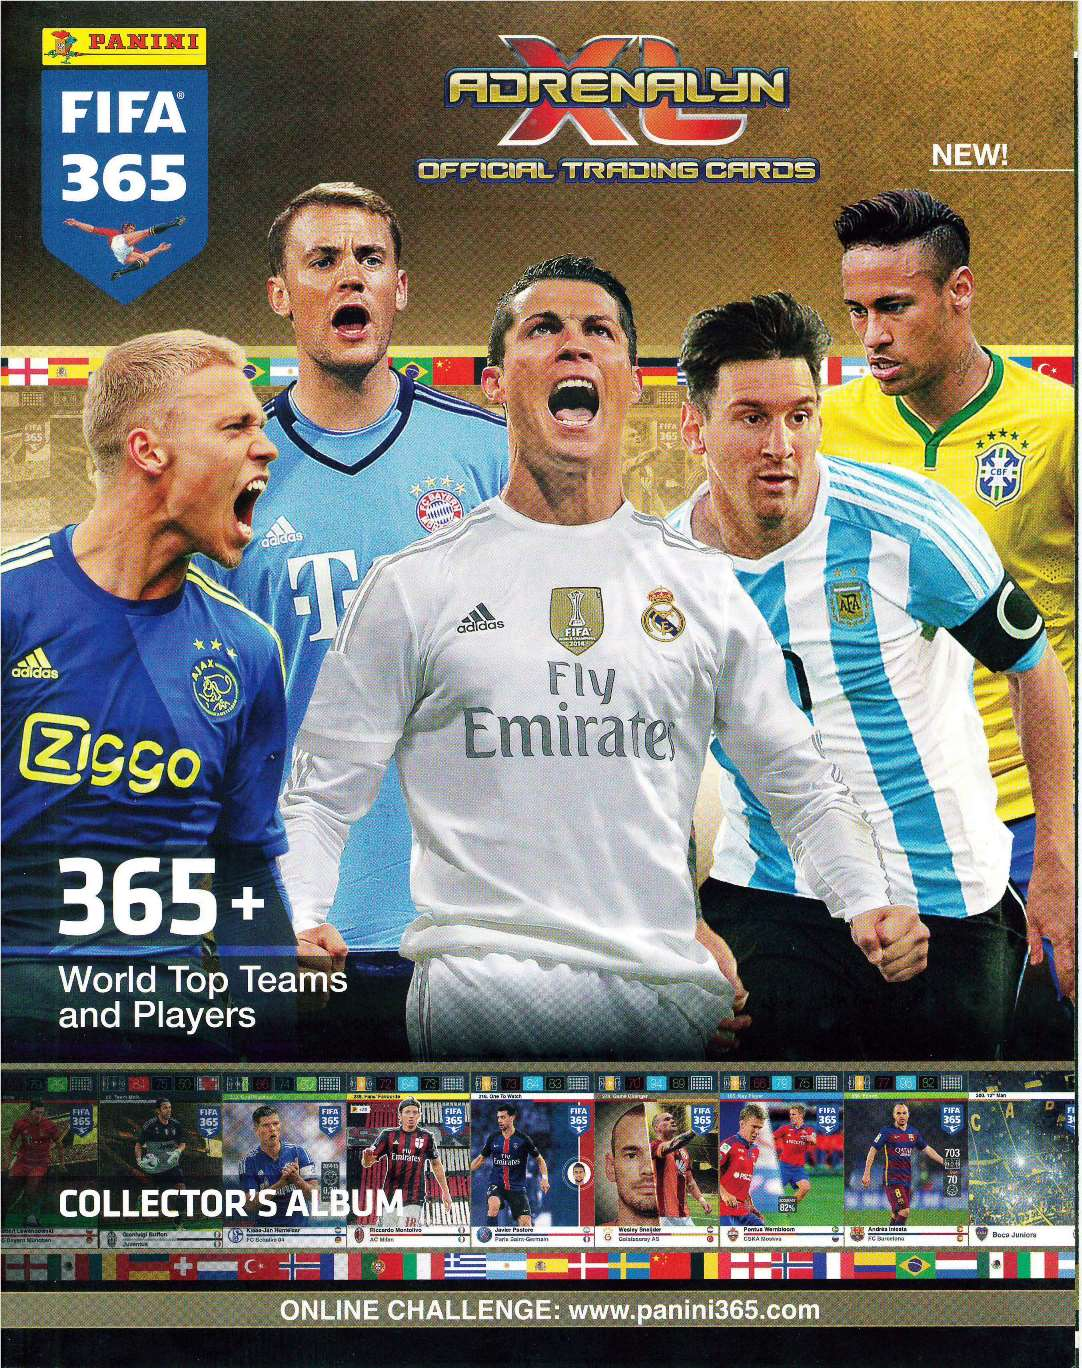 Adrenalyn Xl Fifa 365 2016 Panini Trading Cards Elsaber21